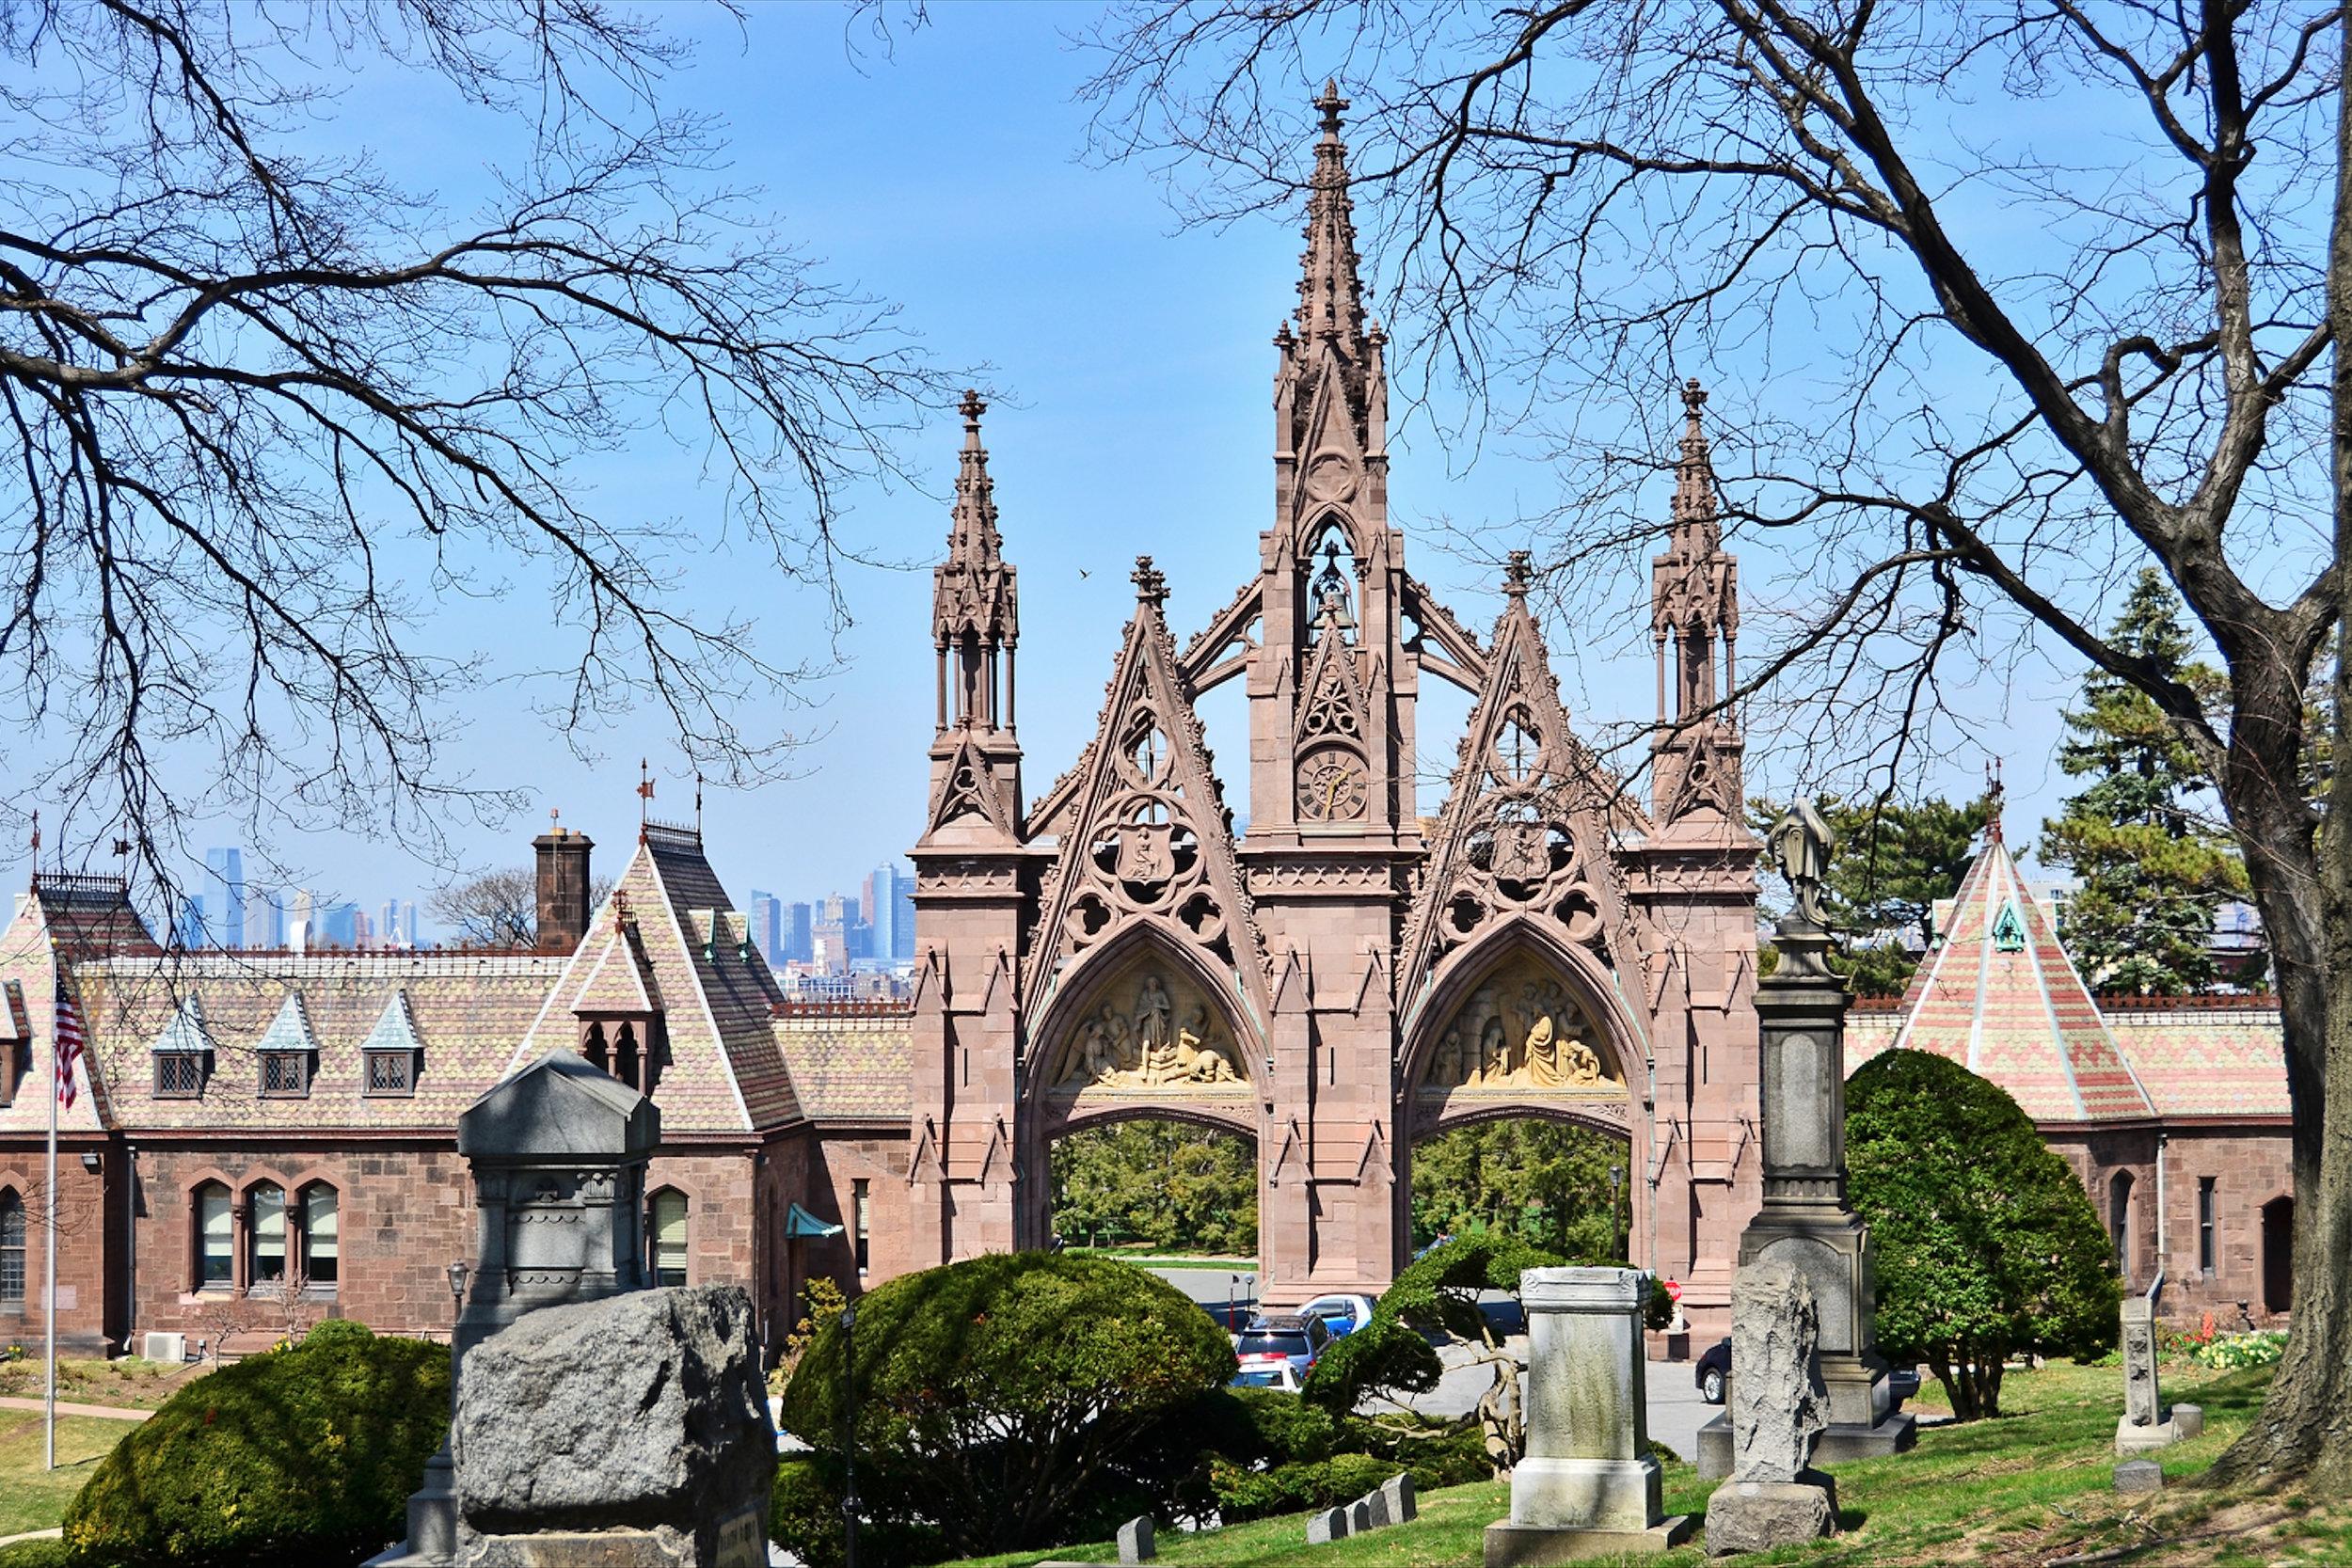 Кладбище гринвуд Бруклин нью йорк.jpg